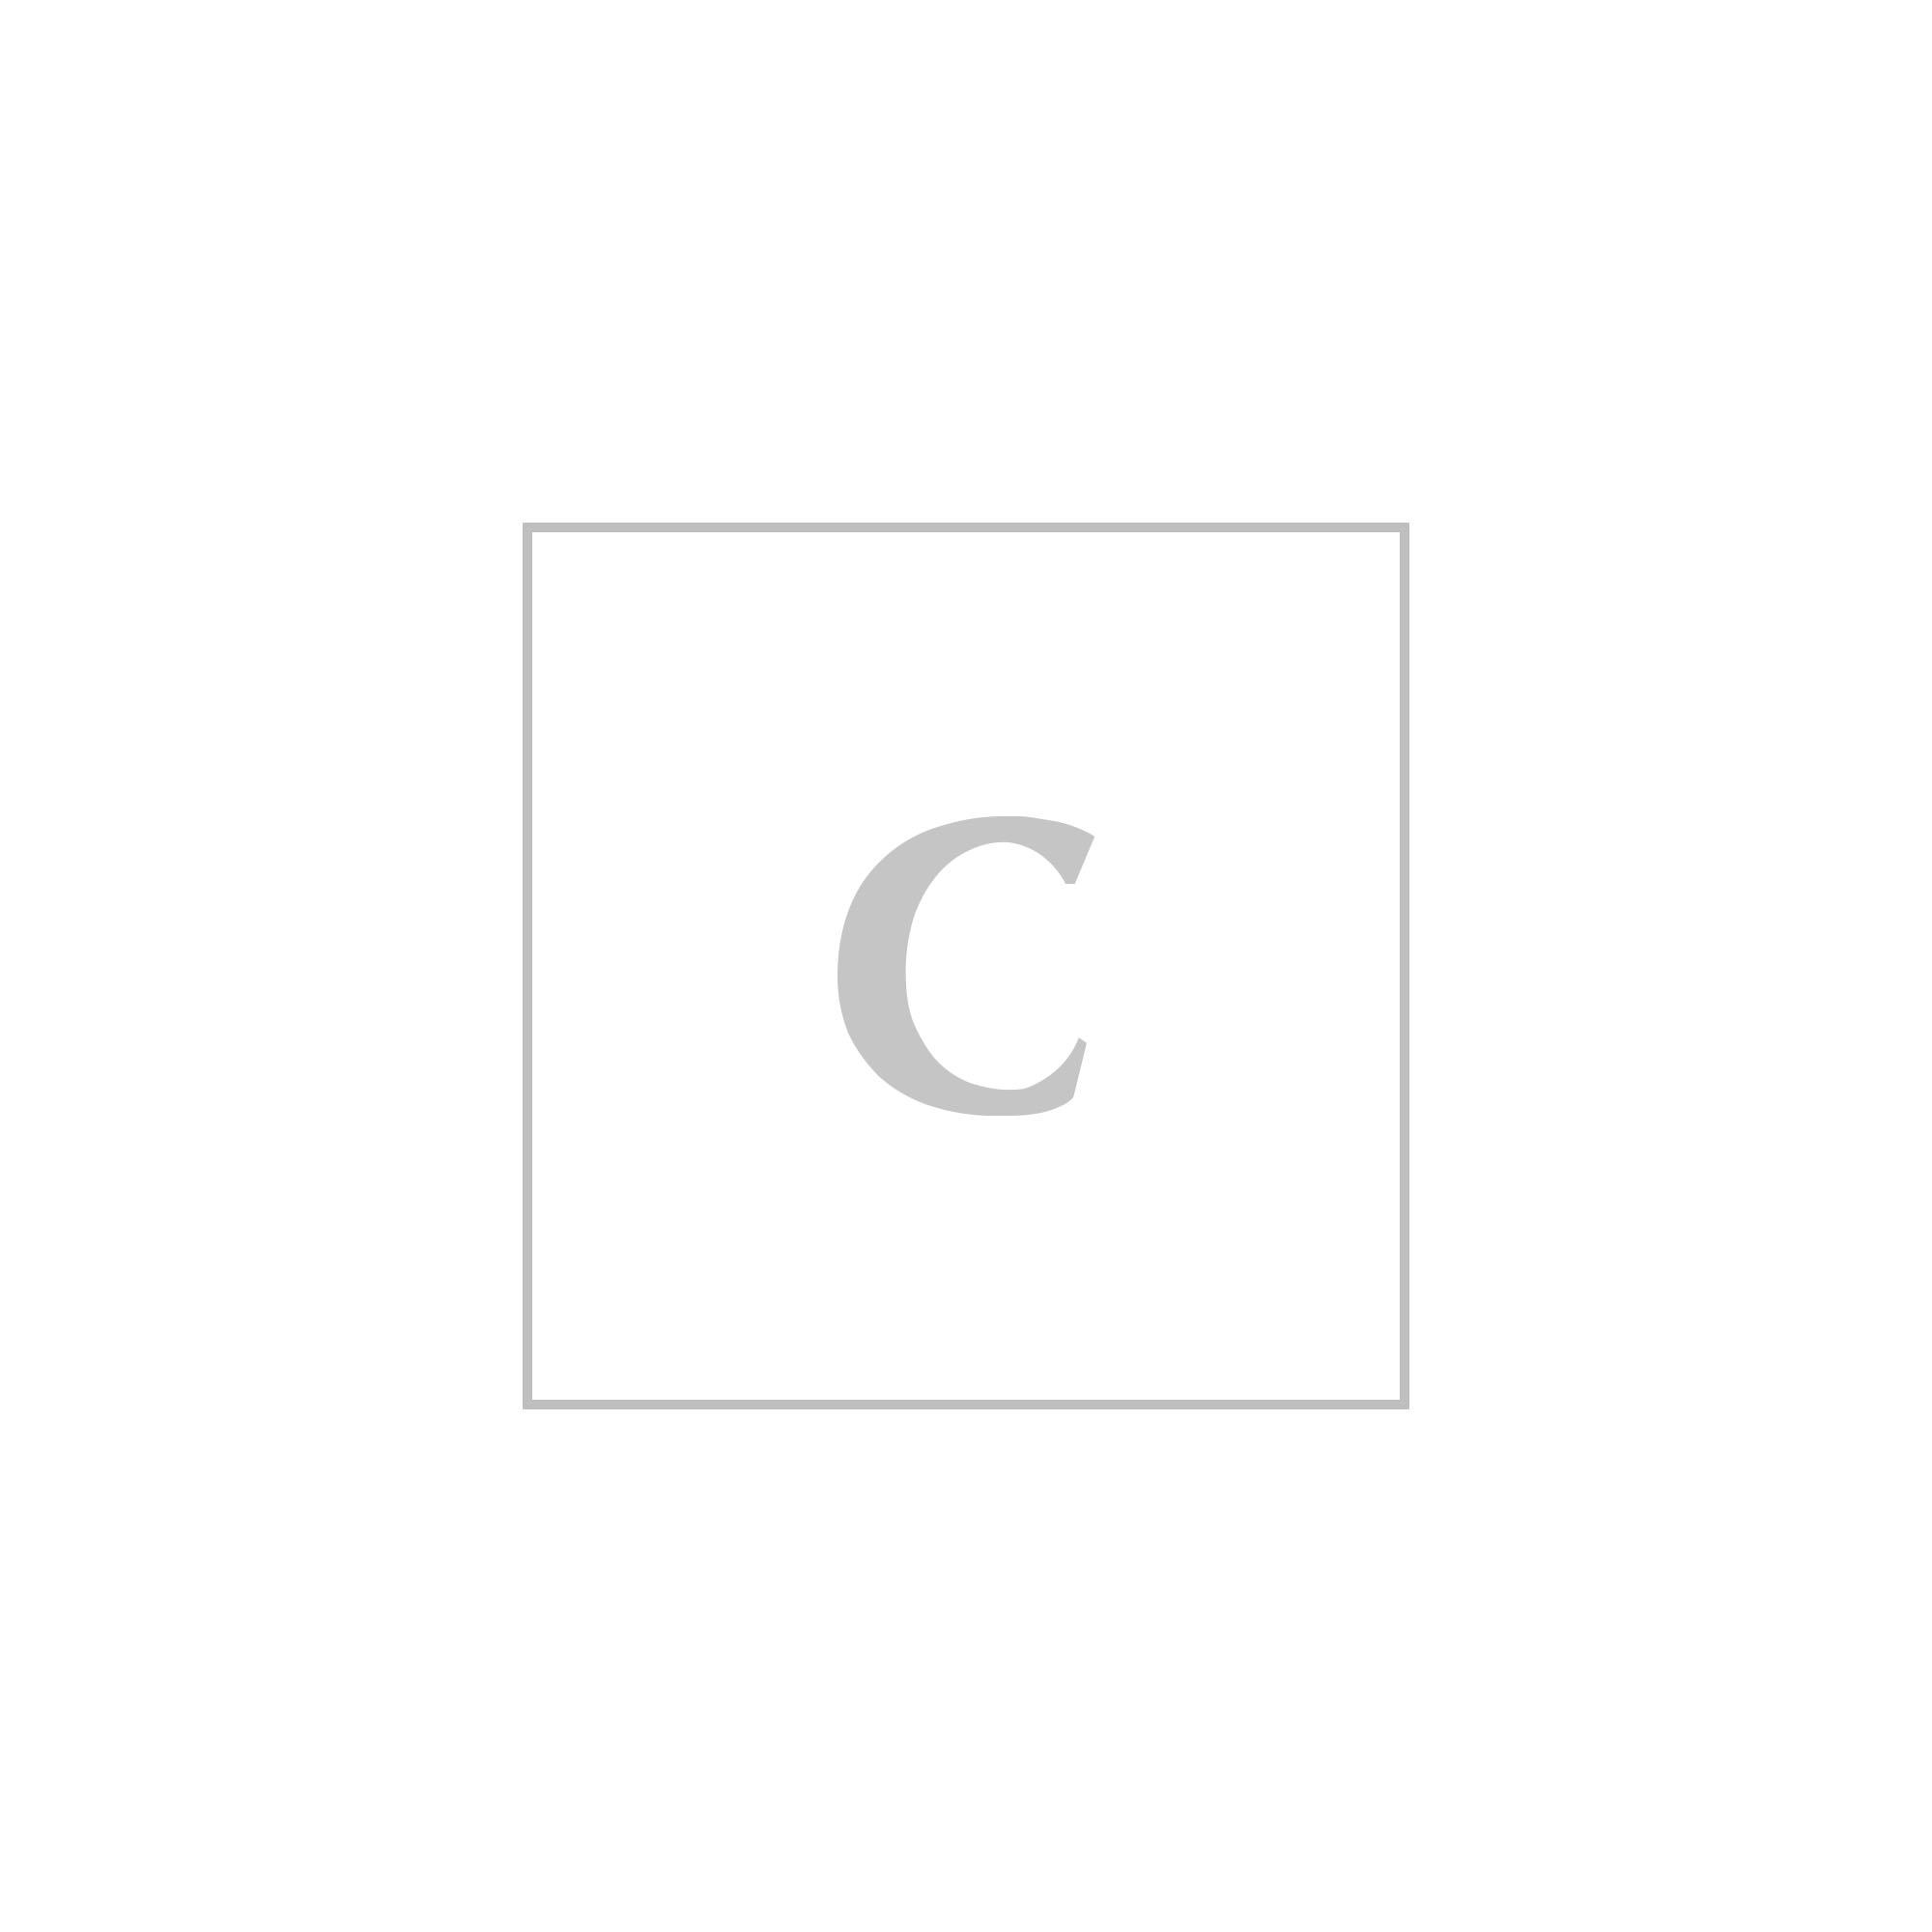 c1ce388c7ce43 Jeans Stella Mccartney for Donna 000005